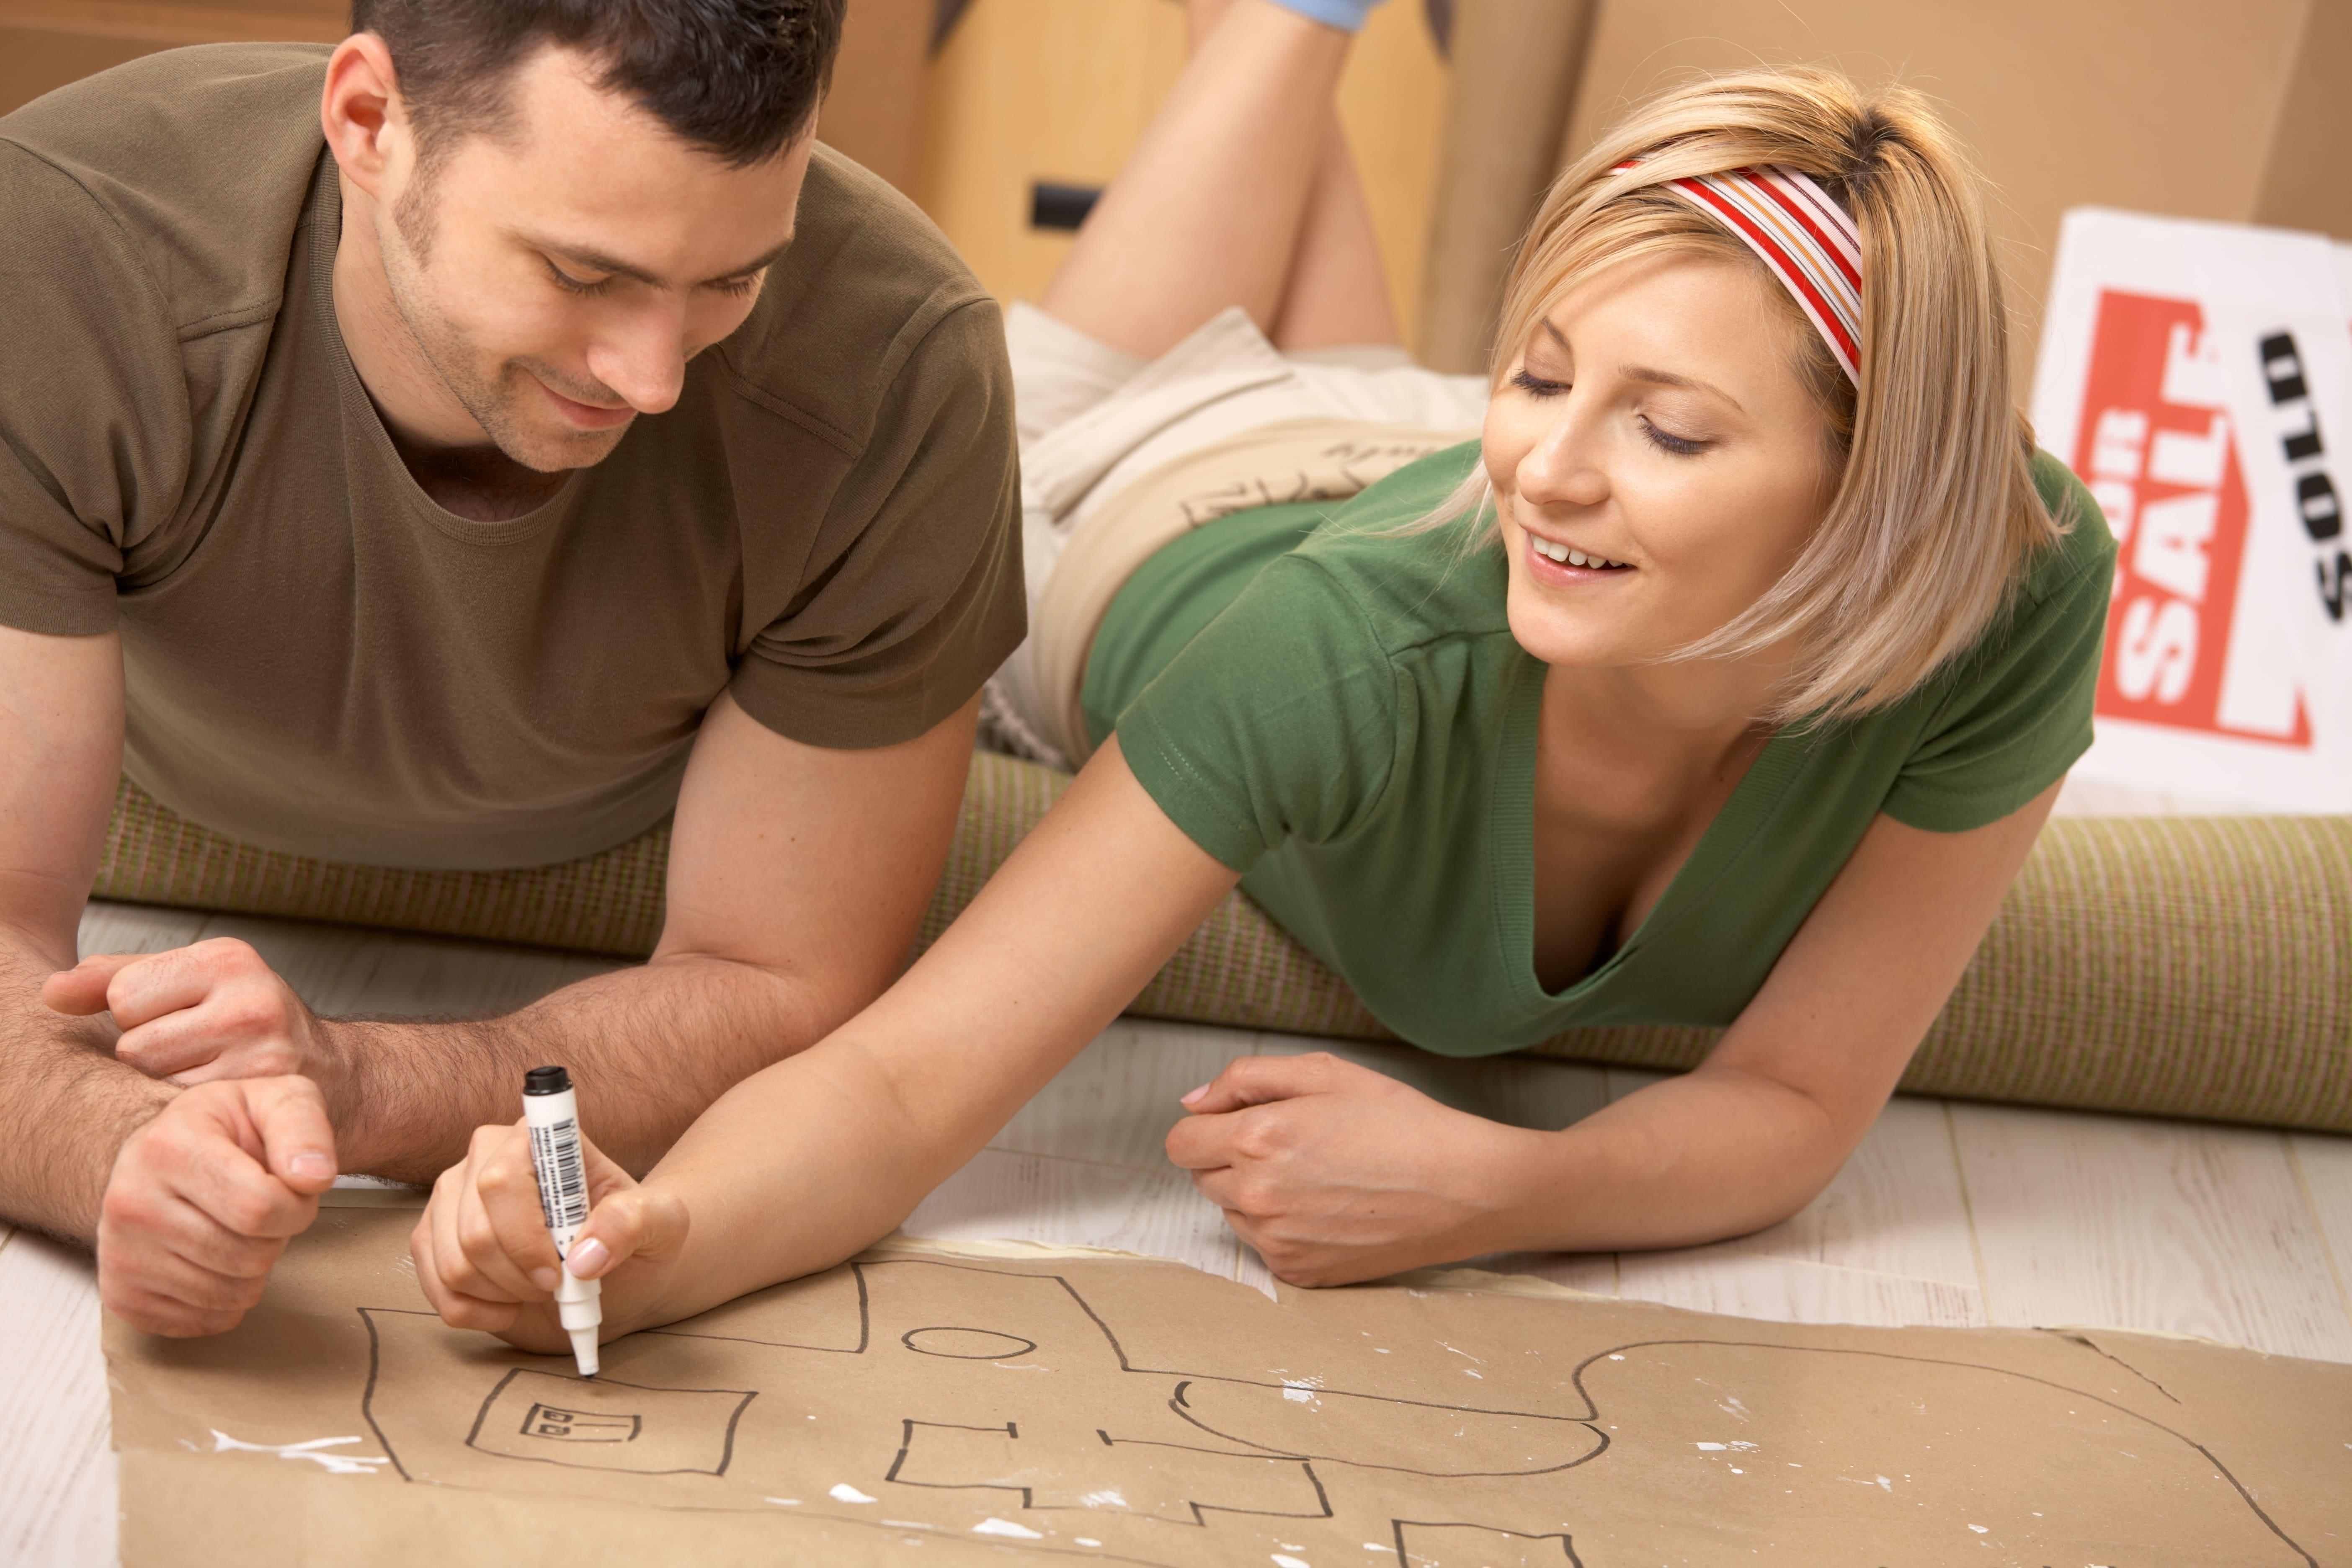 steps to make a good floor plan